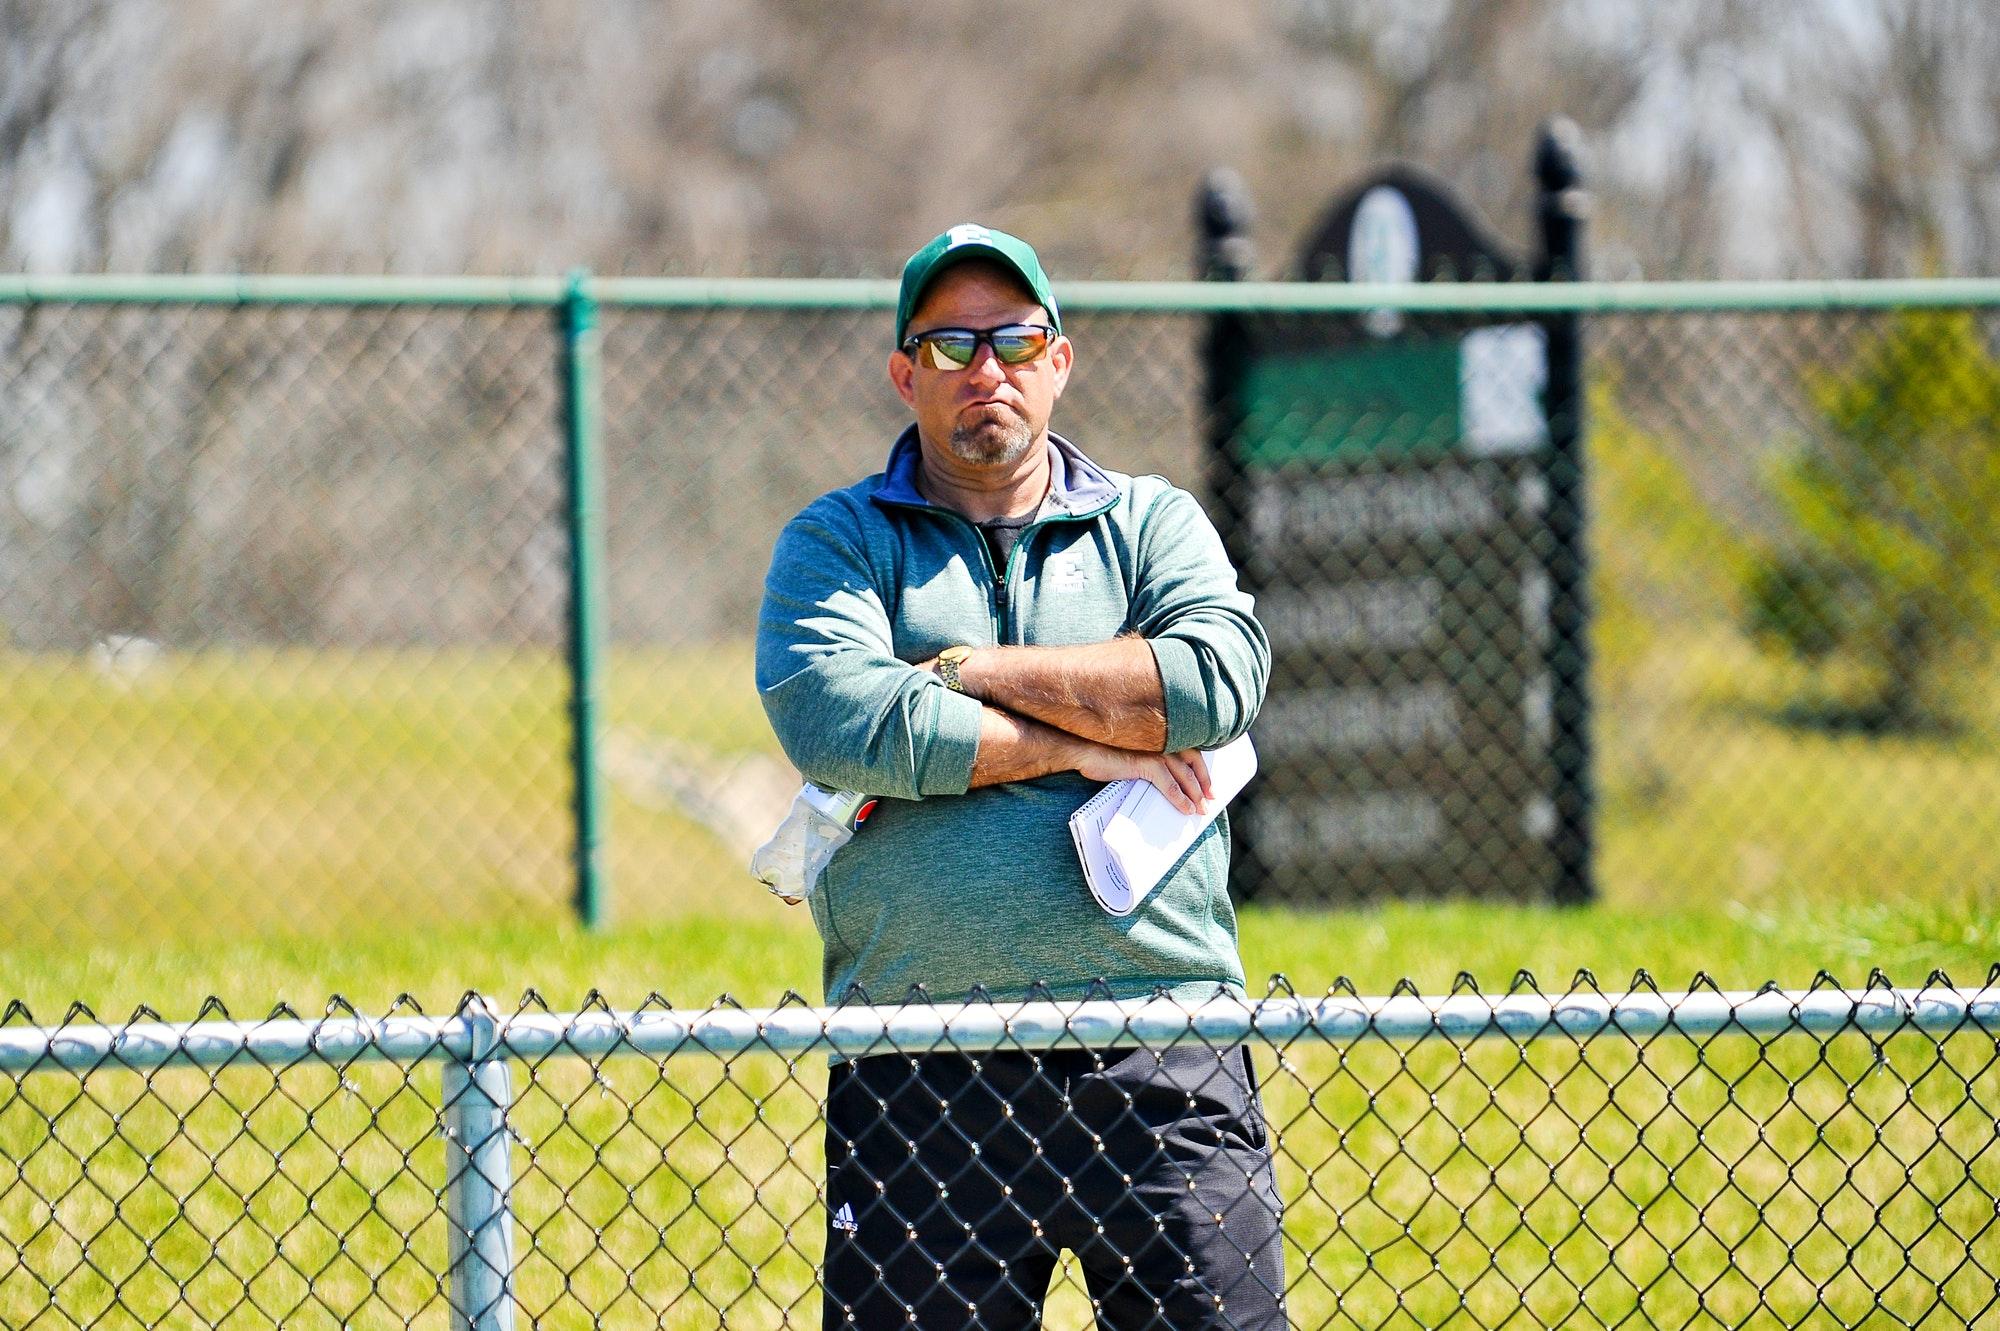 Ryan R. teaches tennis lessons in Omaha, NE